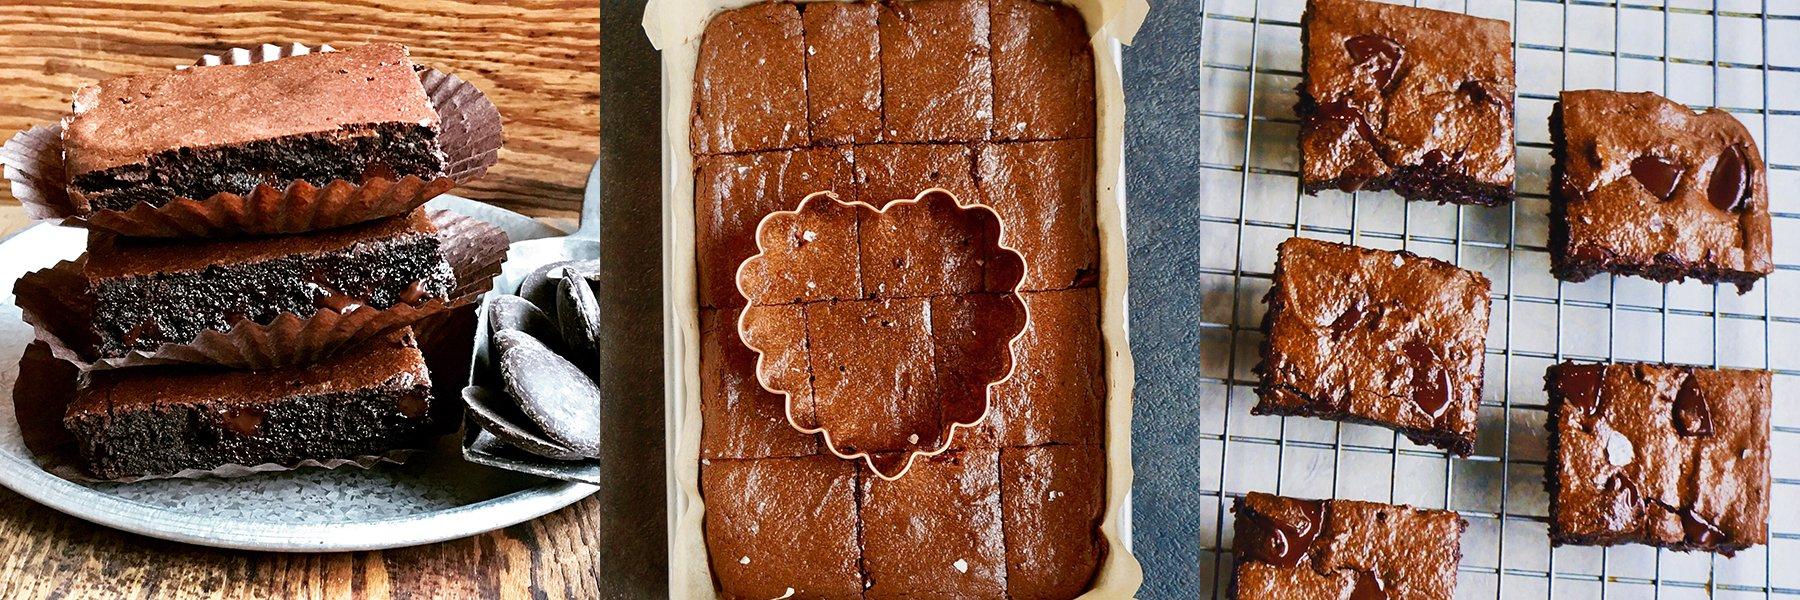 Brownies Espectaculáres - Webinar en Español